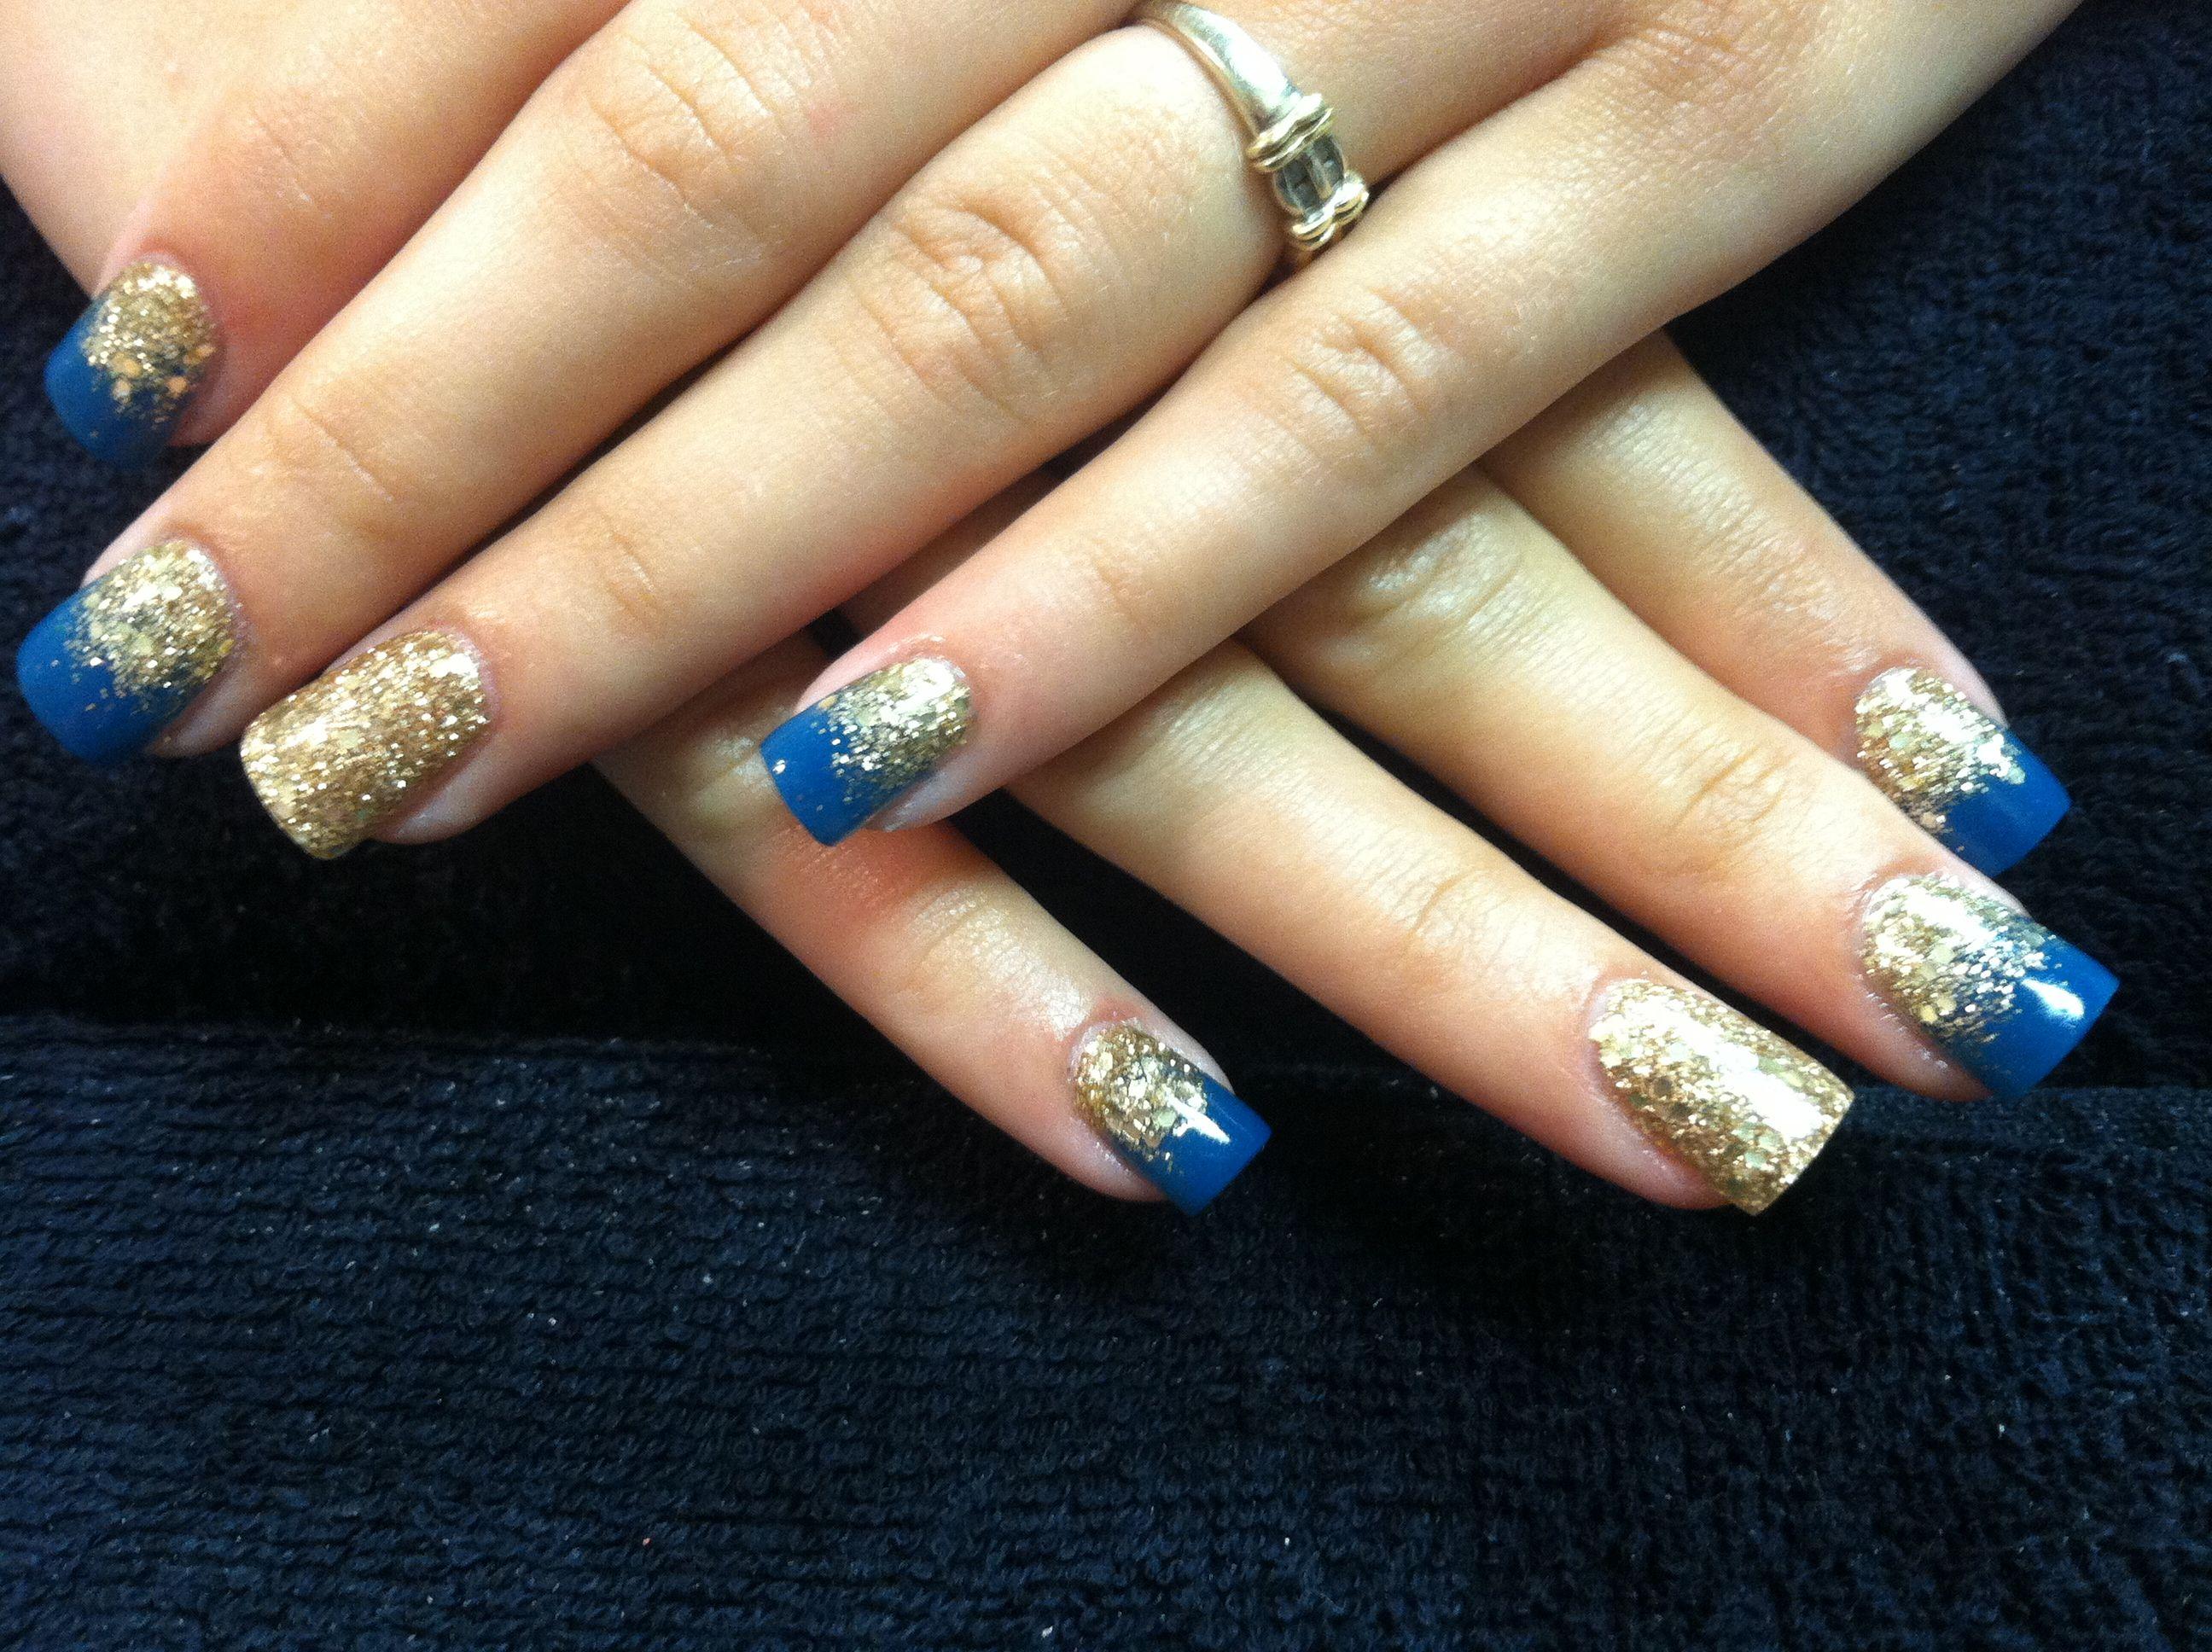 Acrylic nails gold blue glitter fade my acrylic nails for Acrylic nails at salon